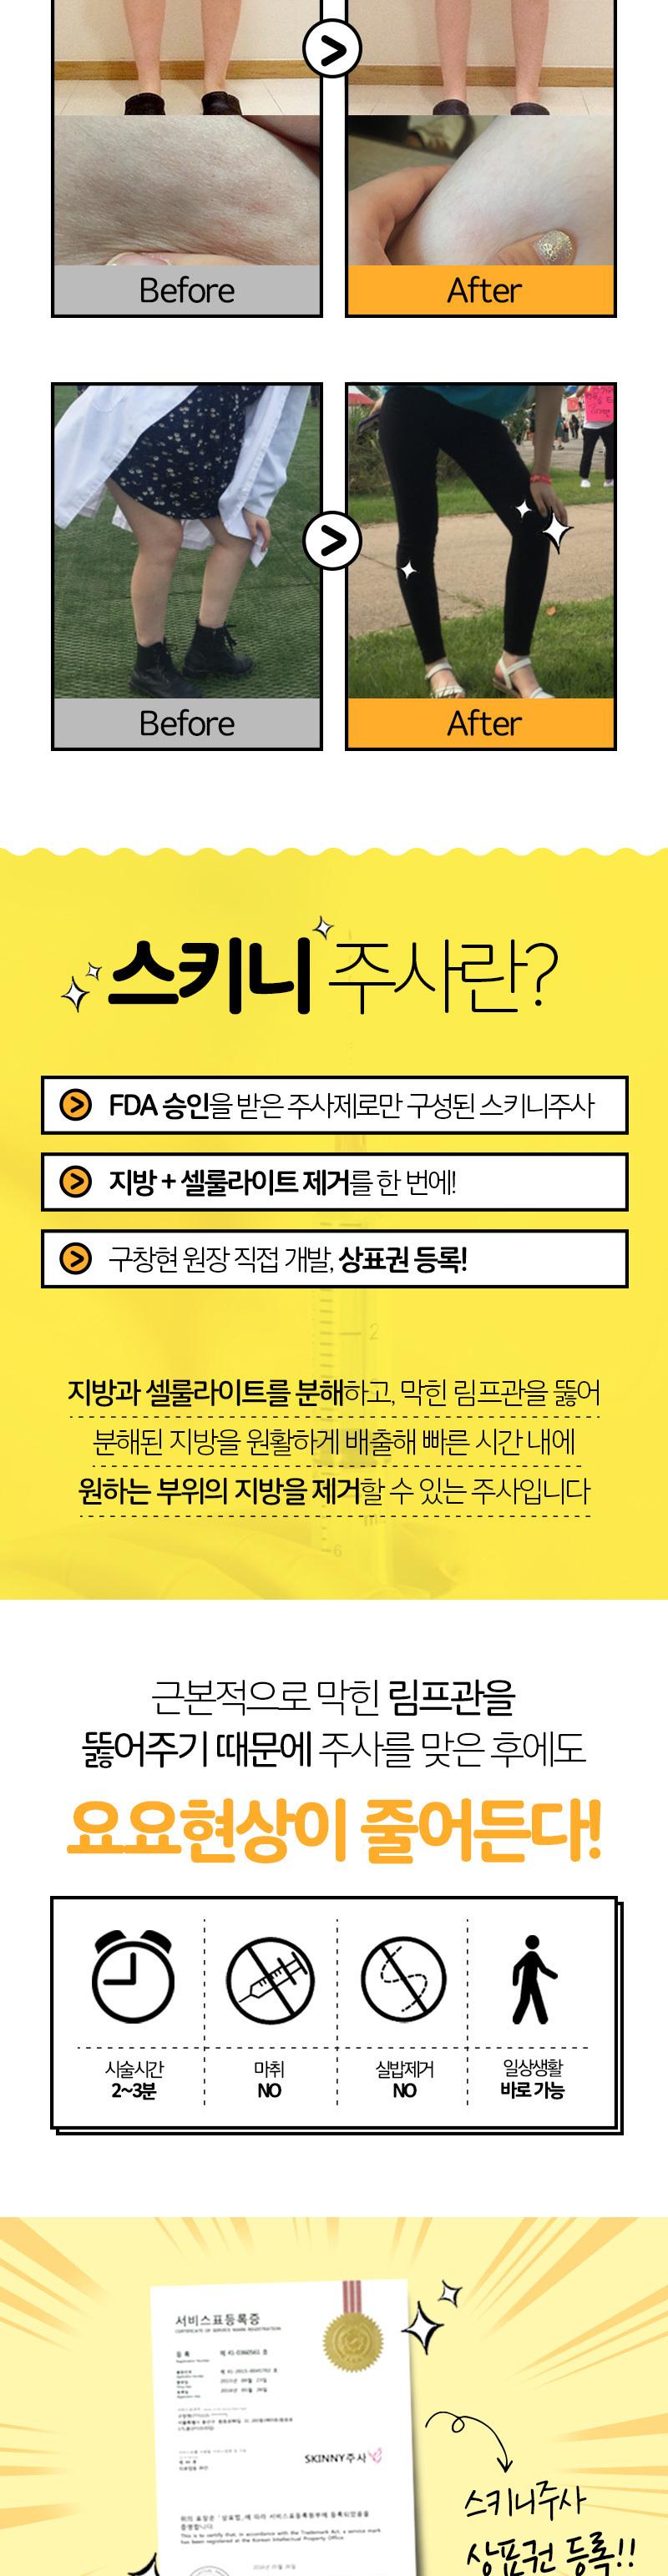 D event info bfdaacb14c255e741b